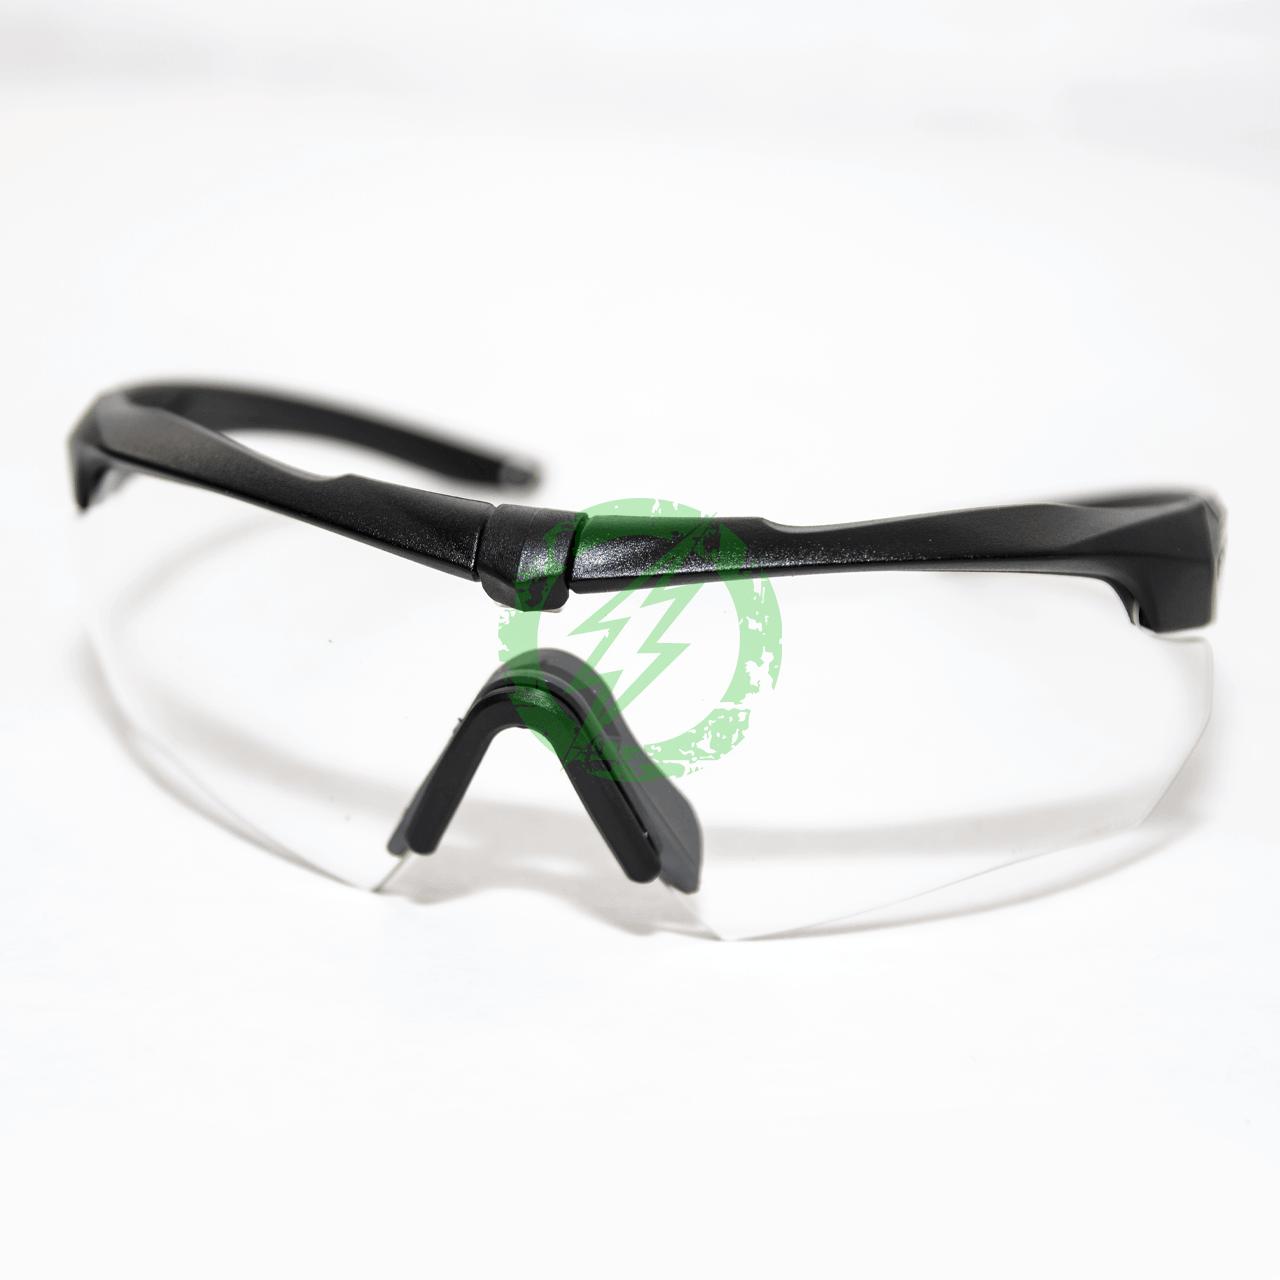 ESS Eyewear 740-0615 Crossbow One Sunglasses Clear Lens//Black Frame